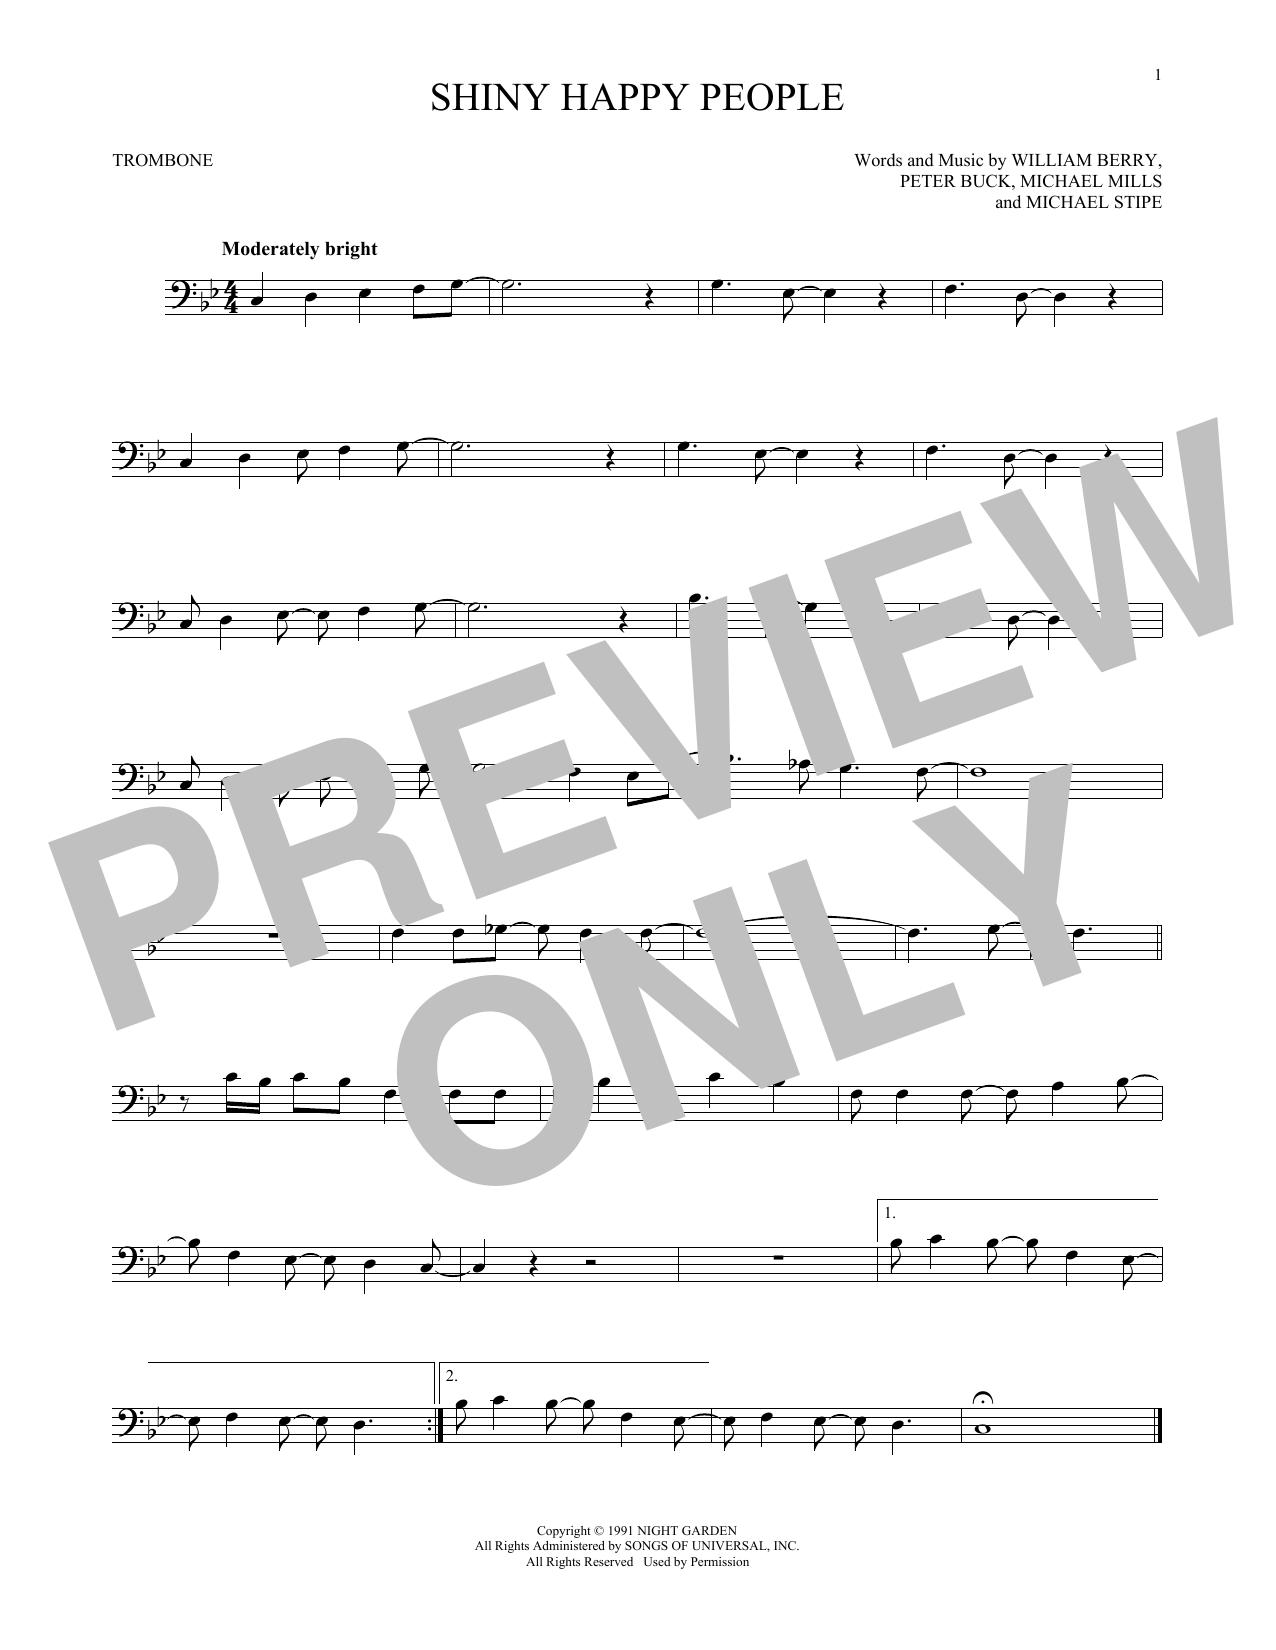 Shiny Happy People (Trombone Solo)